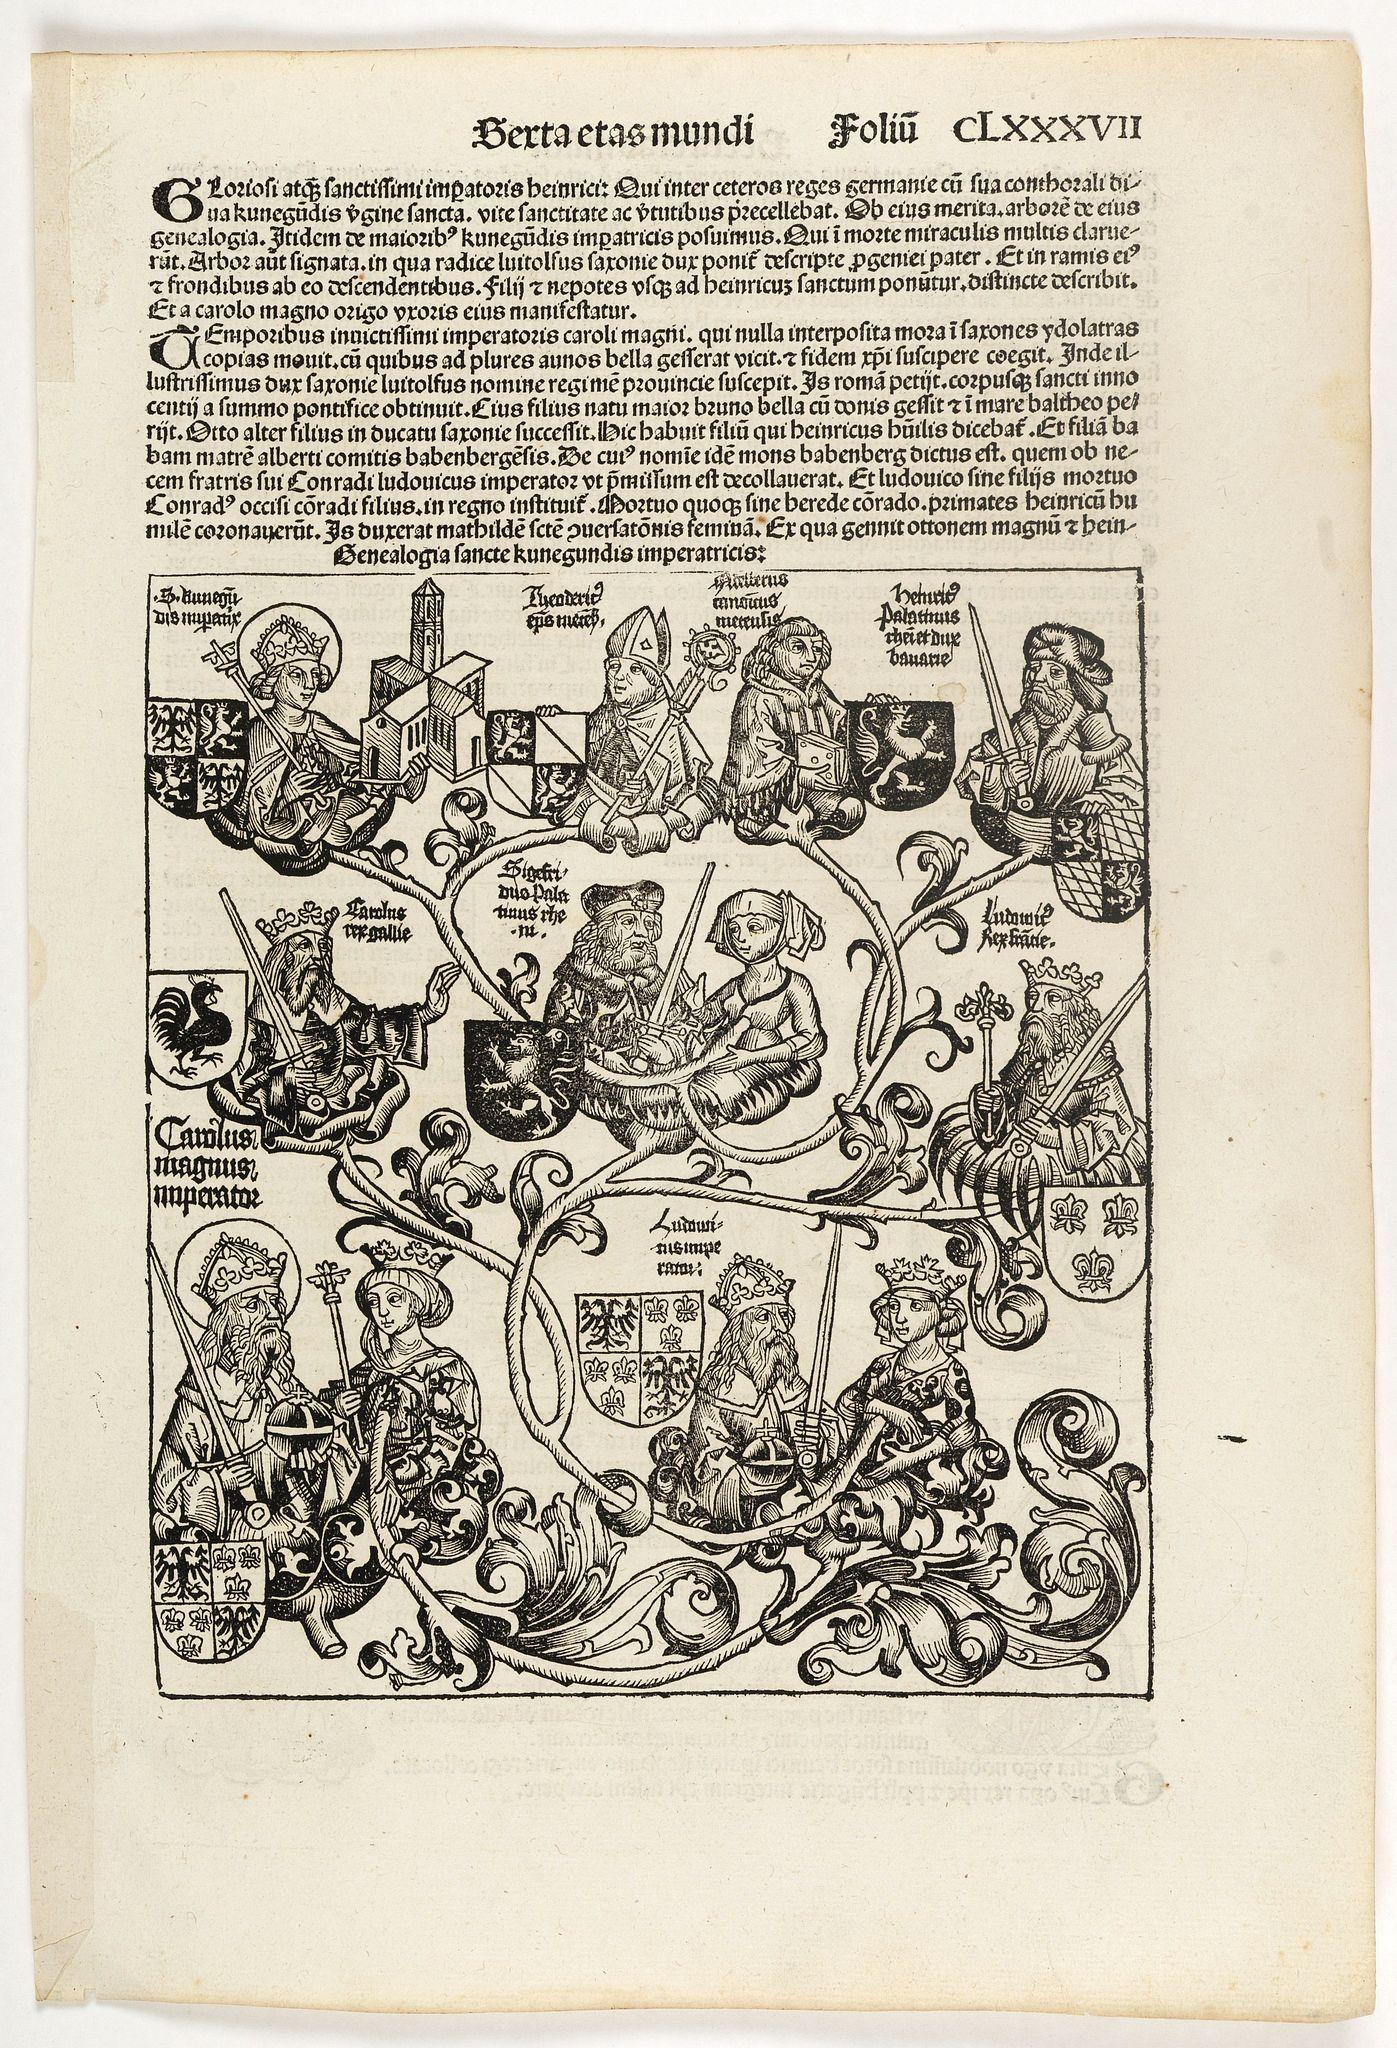 SCHEDEL, H. -  Sexta Etas Mundi. Folio CLXXXVII